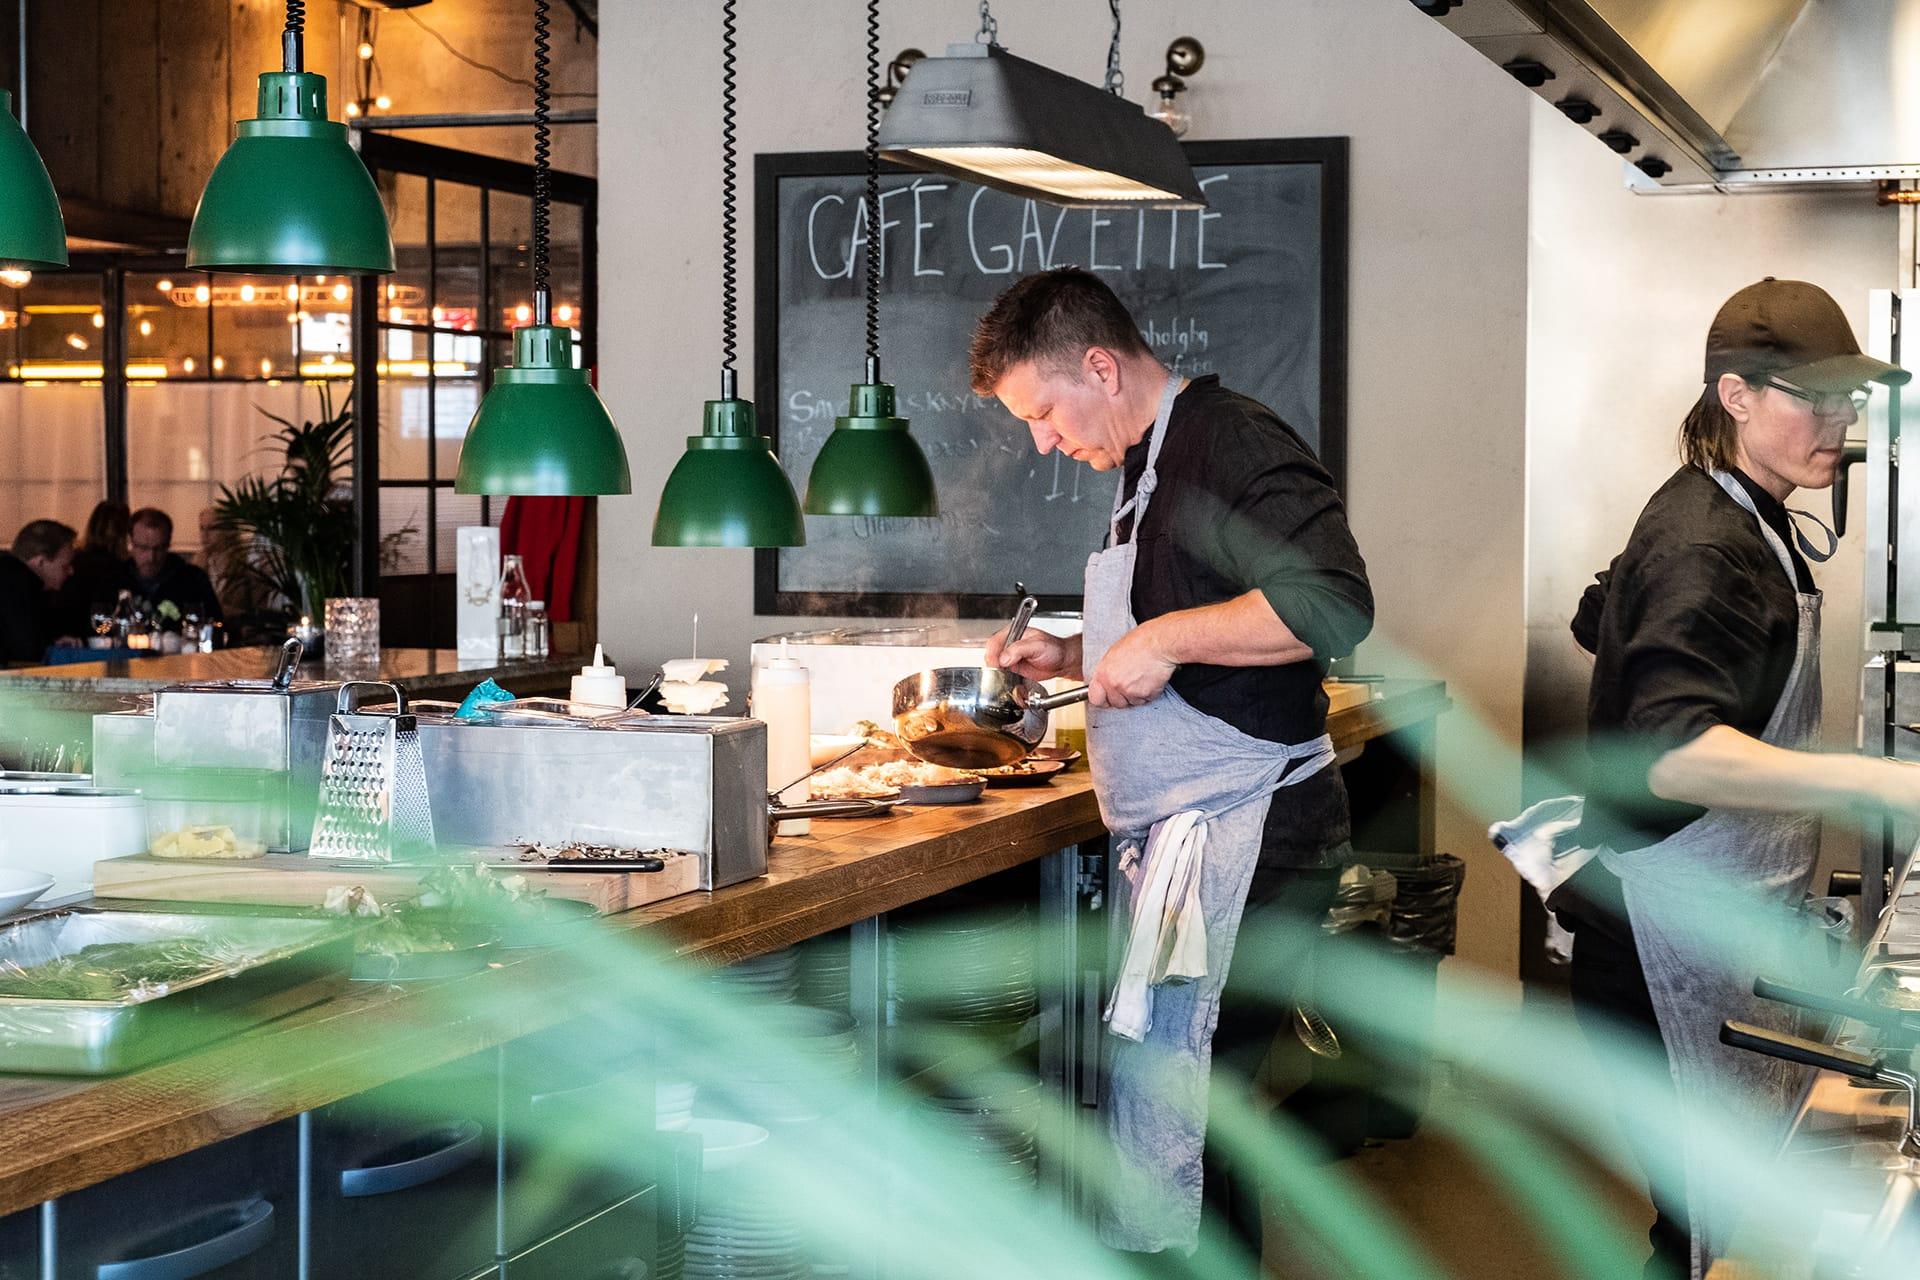 Zamenhof_Cafe_Gazette_Mat_Fotografi_mnecander-8